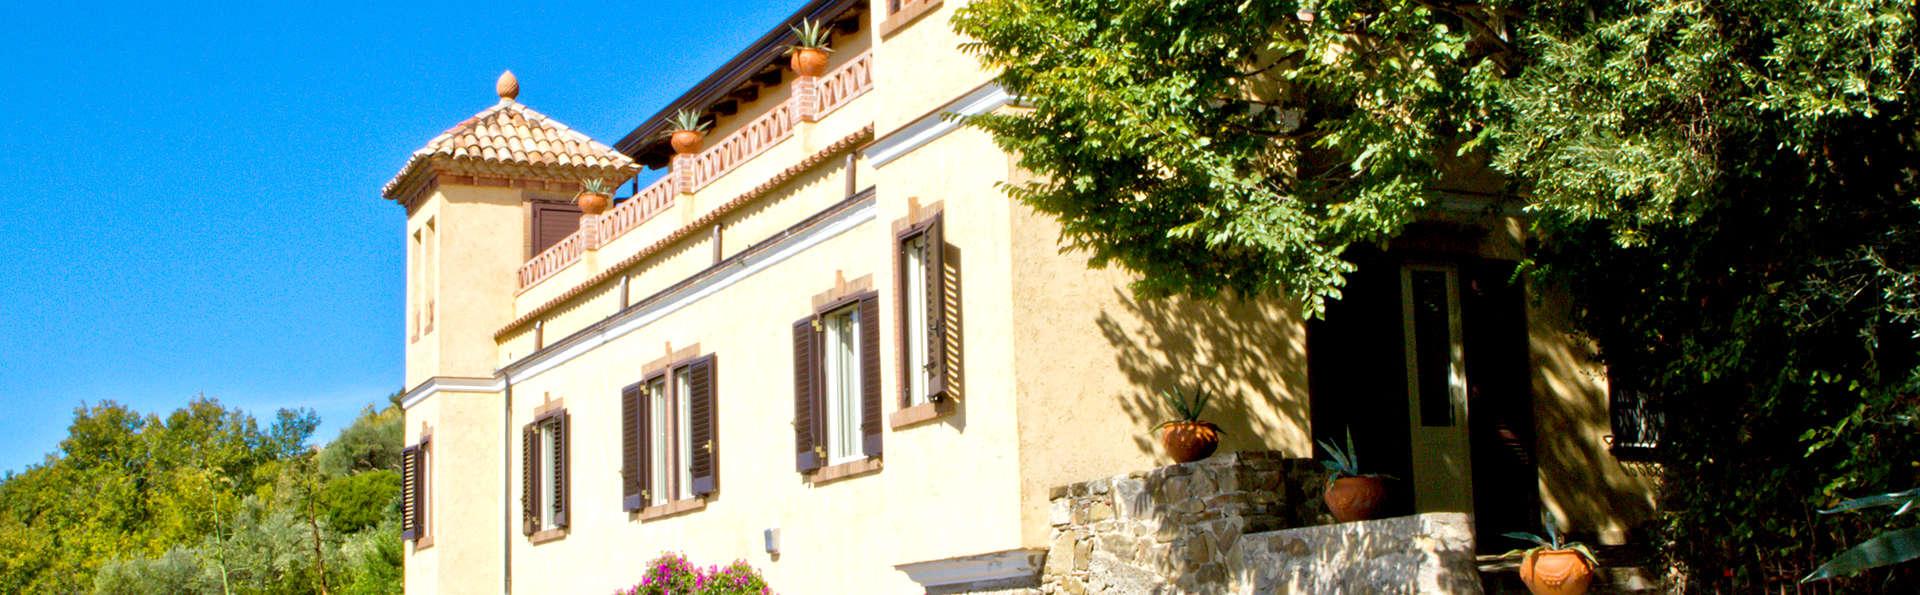 Borgo Riccio - Residenza d'Epoca  - Edit_Front4.jpg